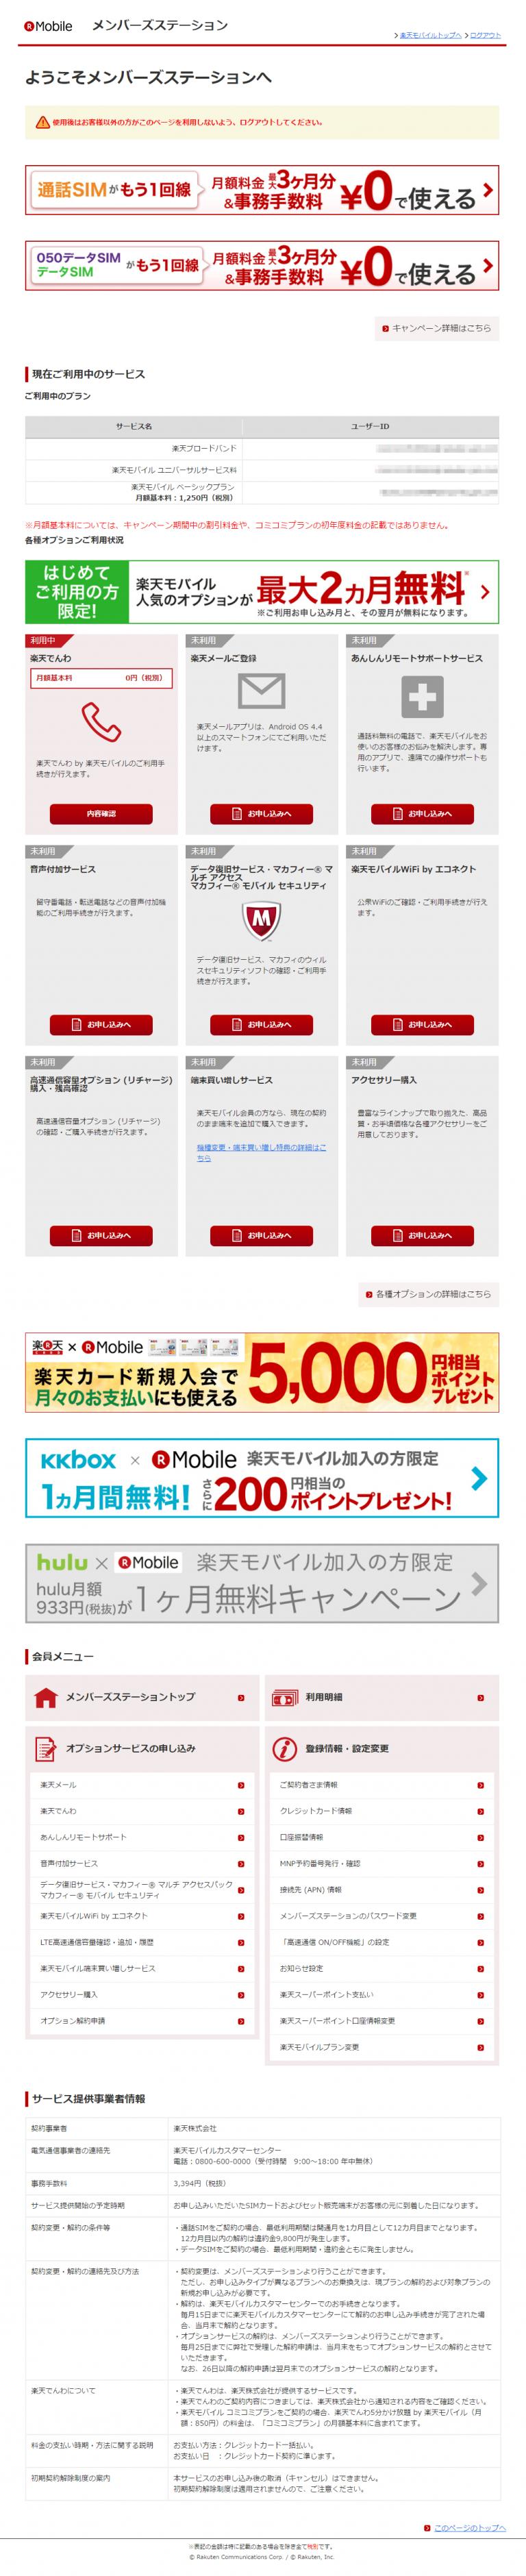 rakuten-mobile-mypage